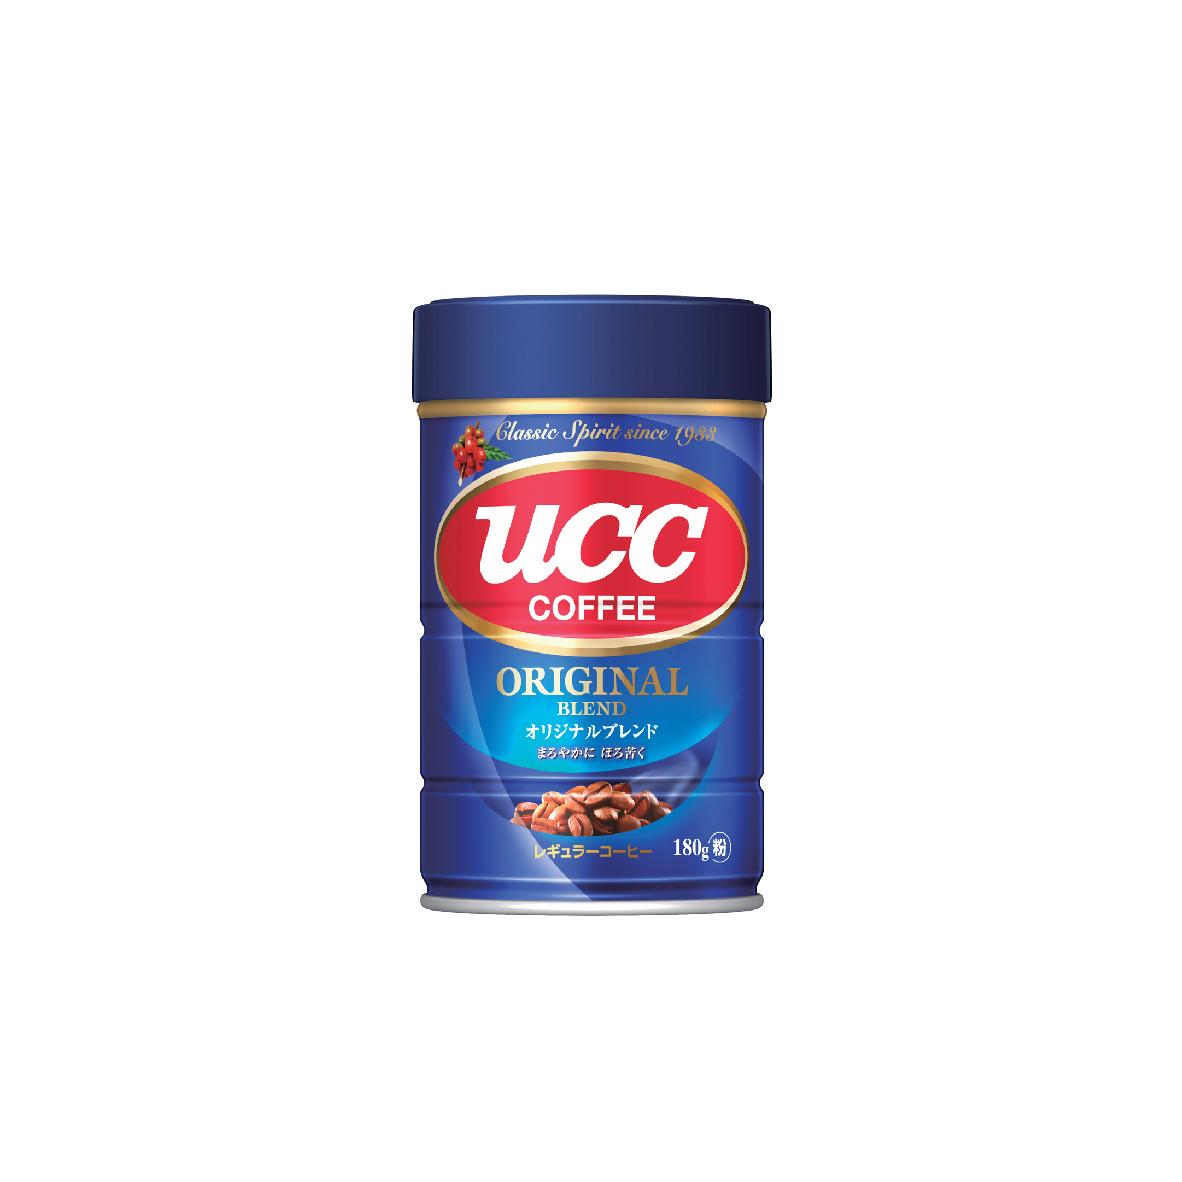 UCC Coffee Original Blend Roasted Coffee